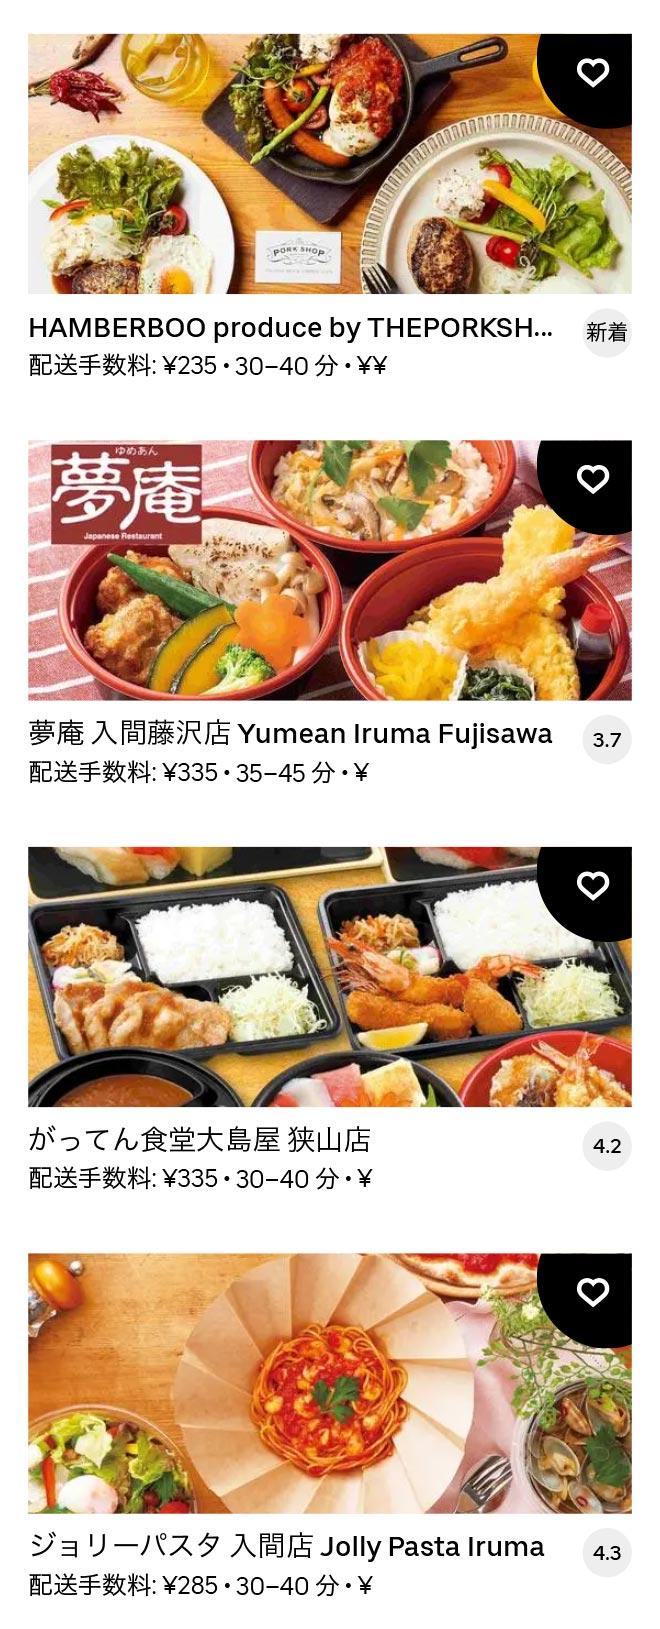 Iruma menu 2101 10